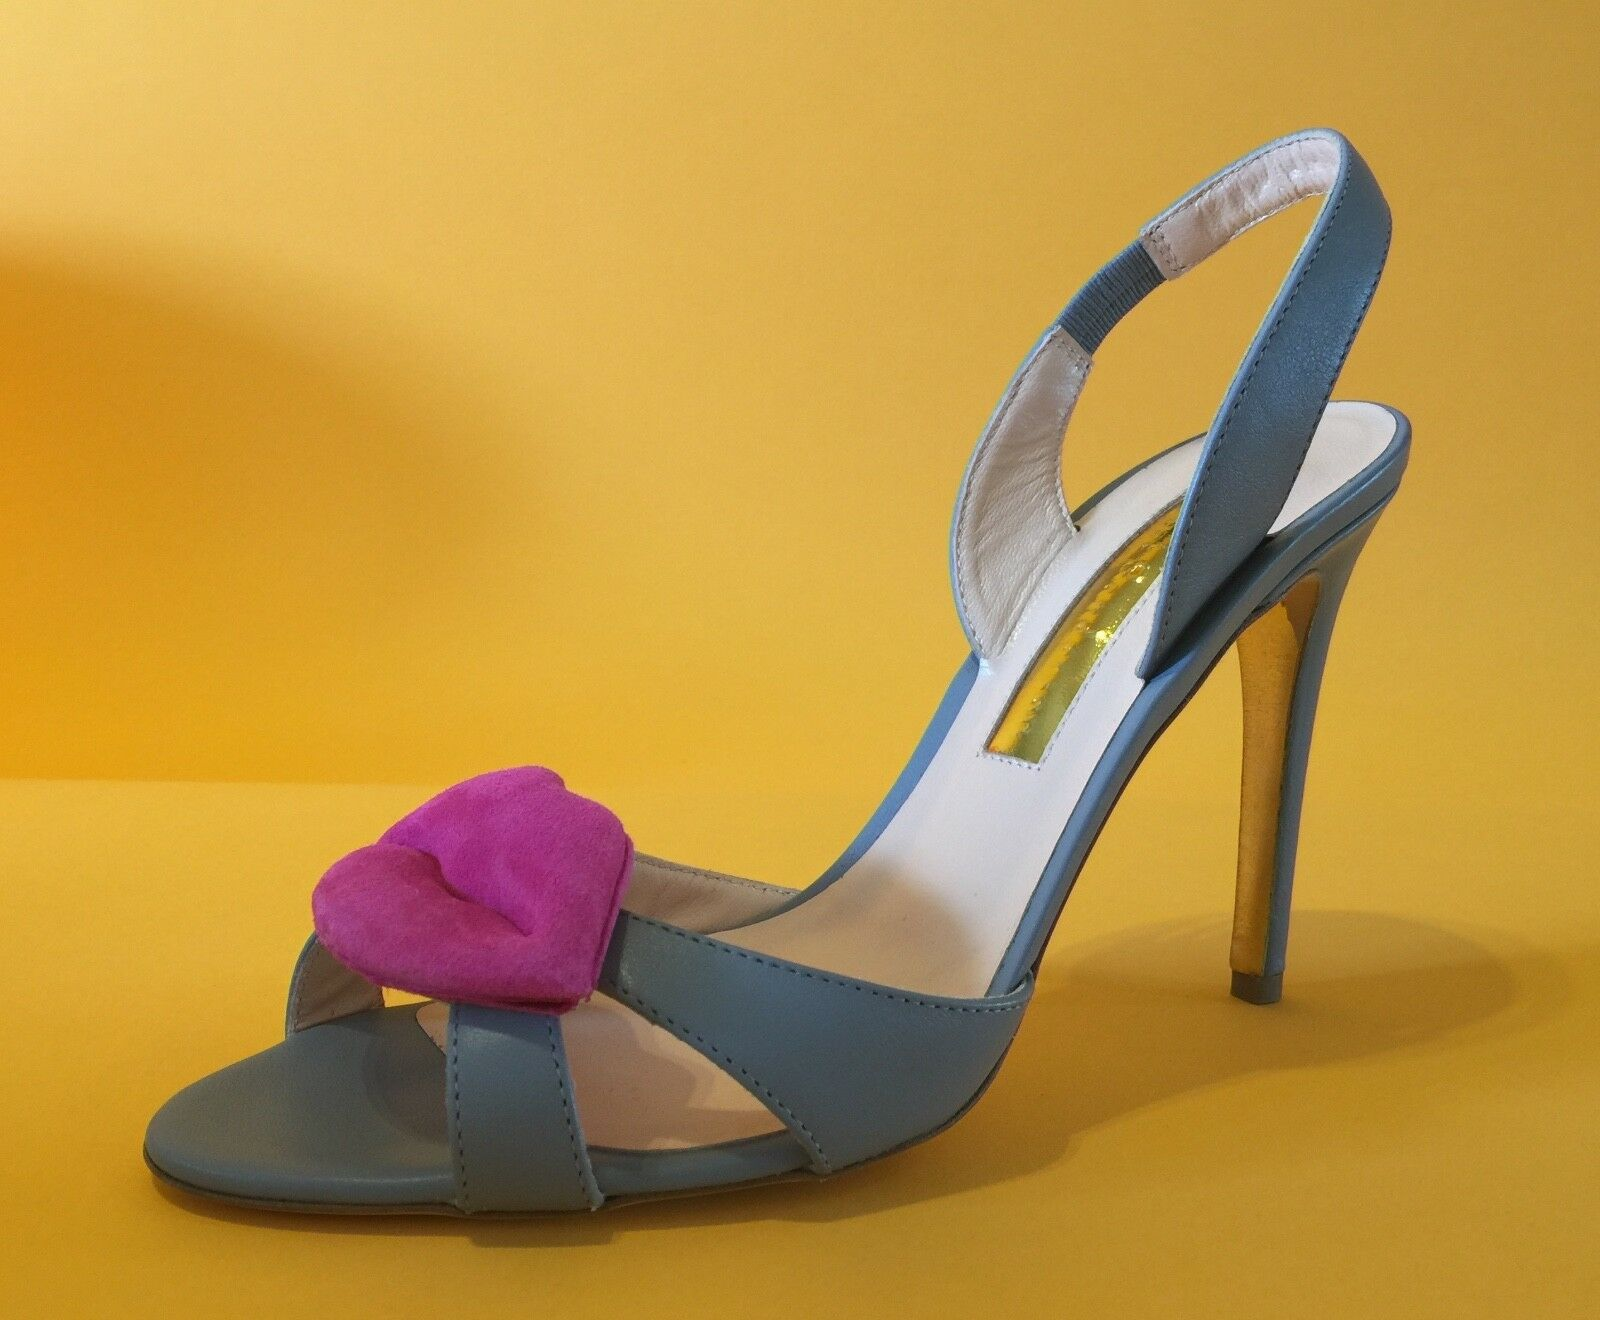 Warehouse Clearance Rupert Sanderson    Graphite Grey  Sandals UK5 EU38